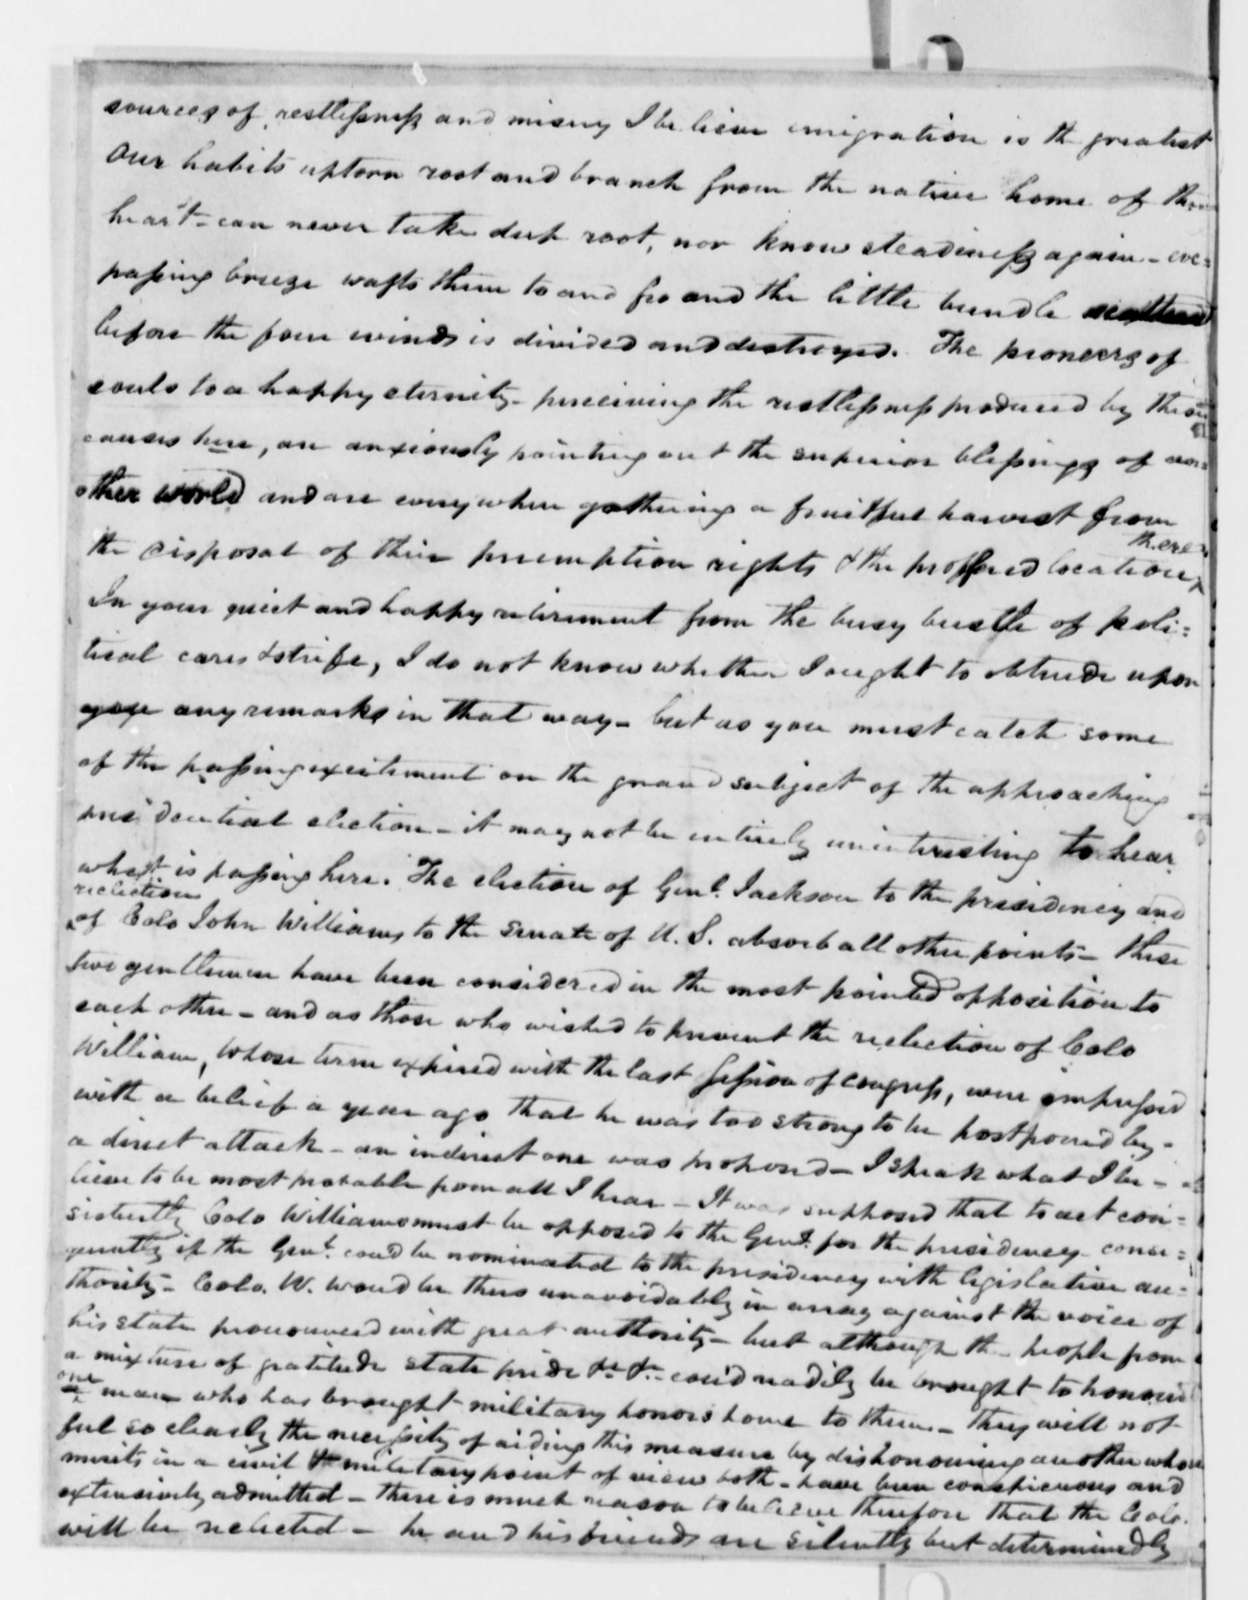 Thomas G. Watkins to Thomas Jefferson, May 4, 1823